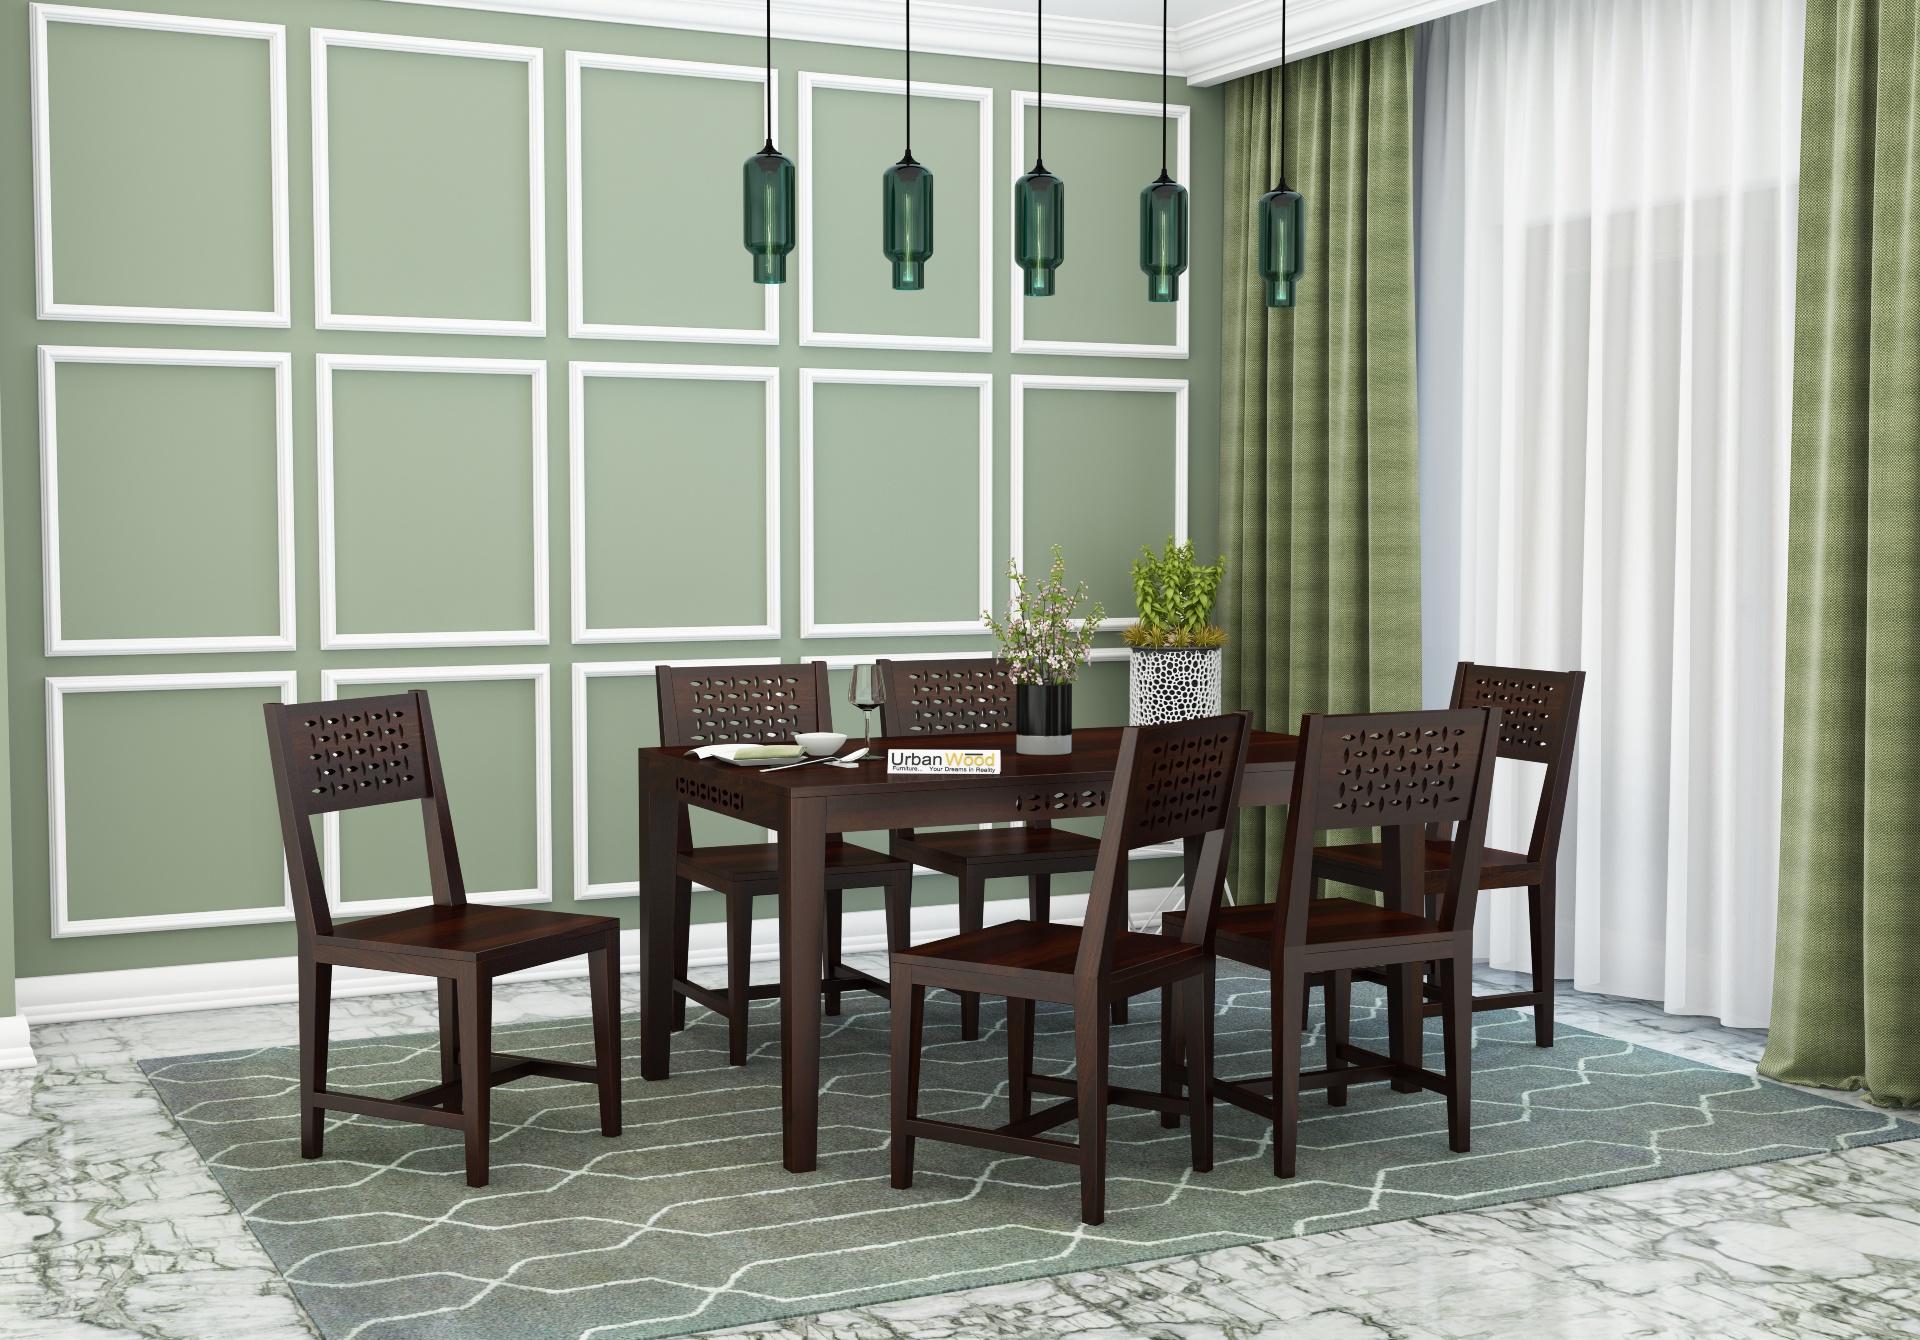 Woodora 6-Seater Dining Set <small>( Walnut Finish )</small>